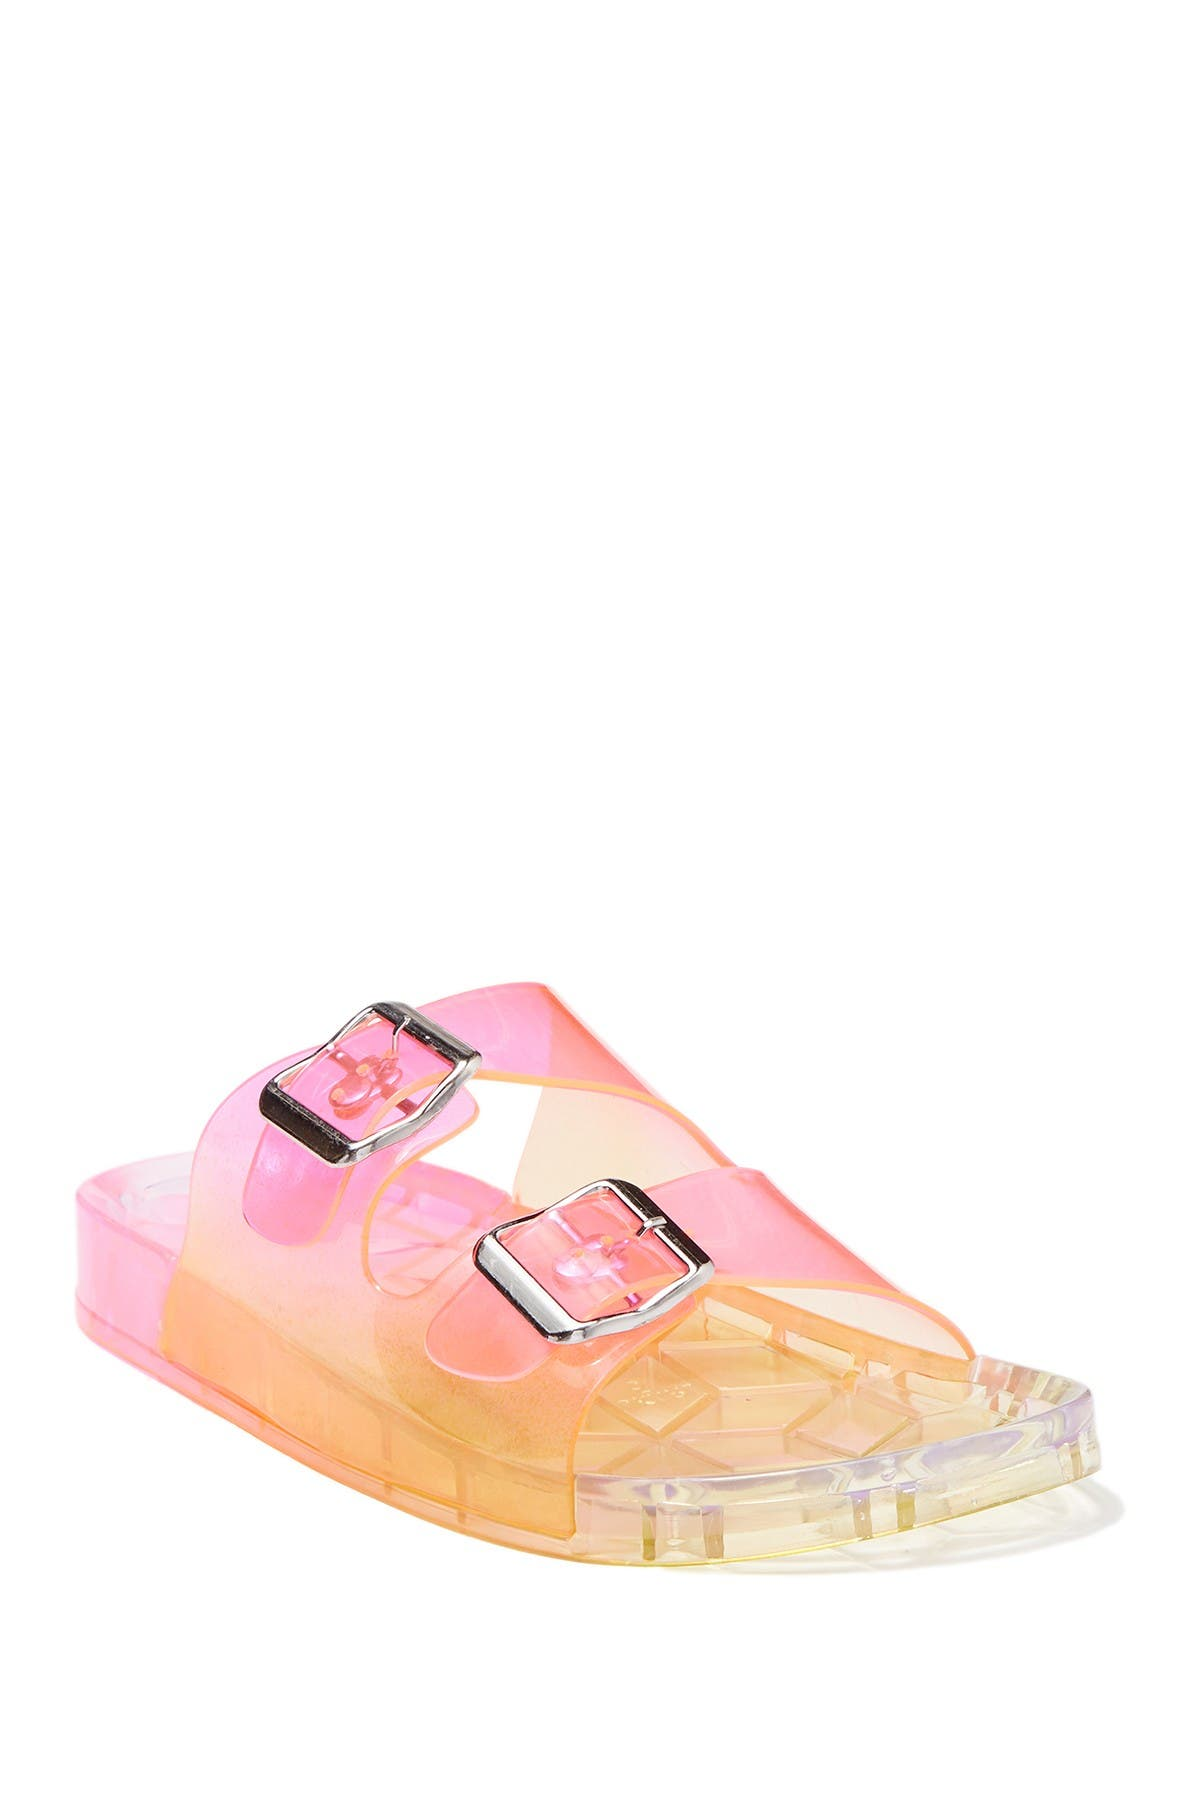 Mario Jelly Double Buckle Slide Sandal